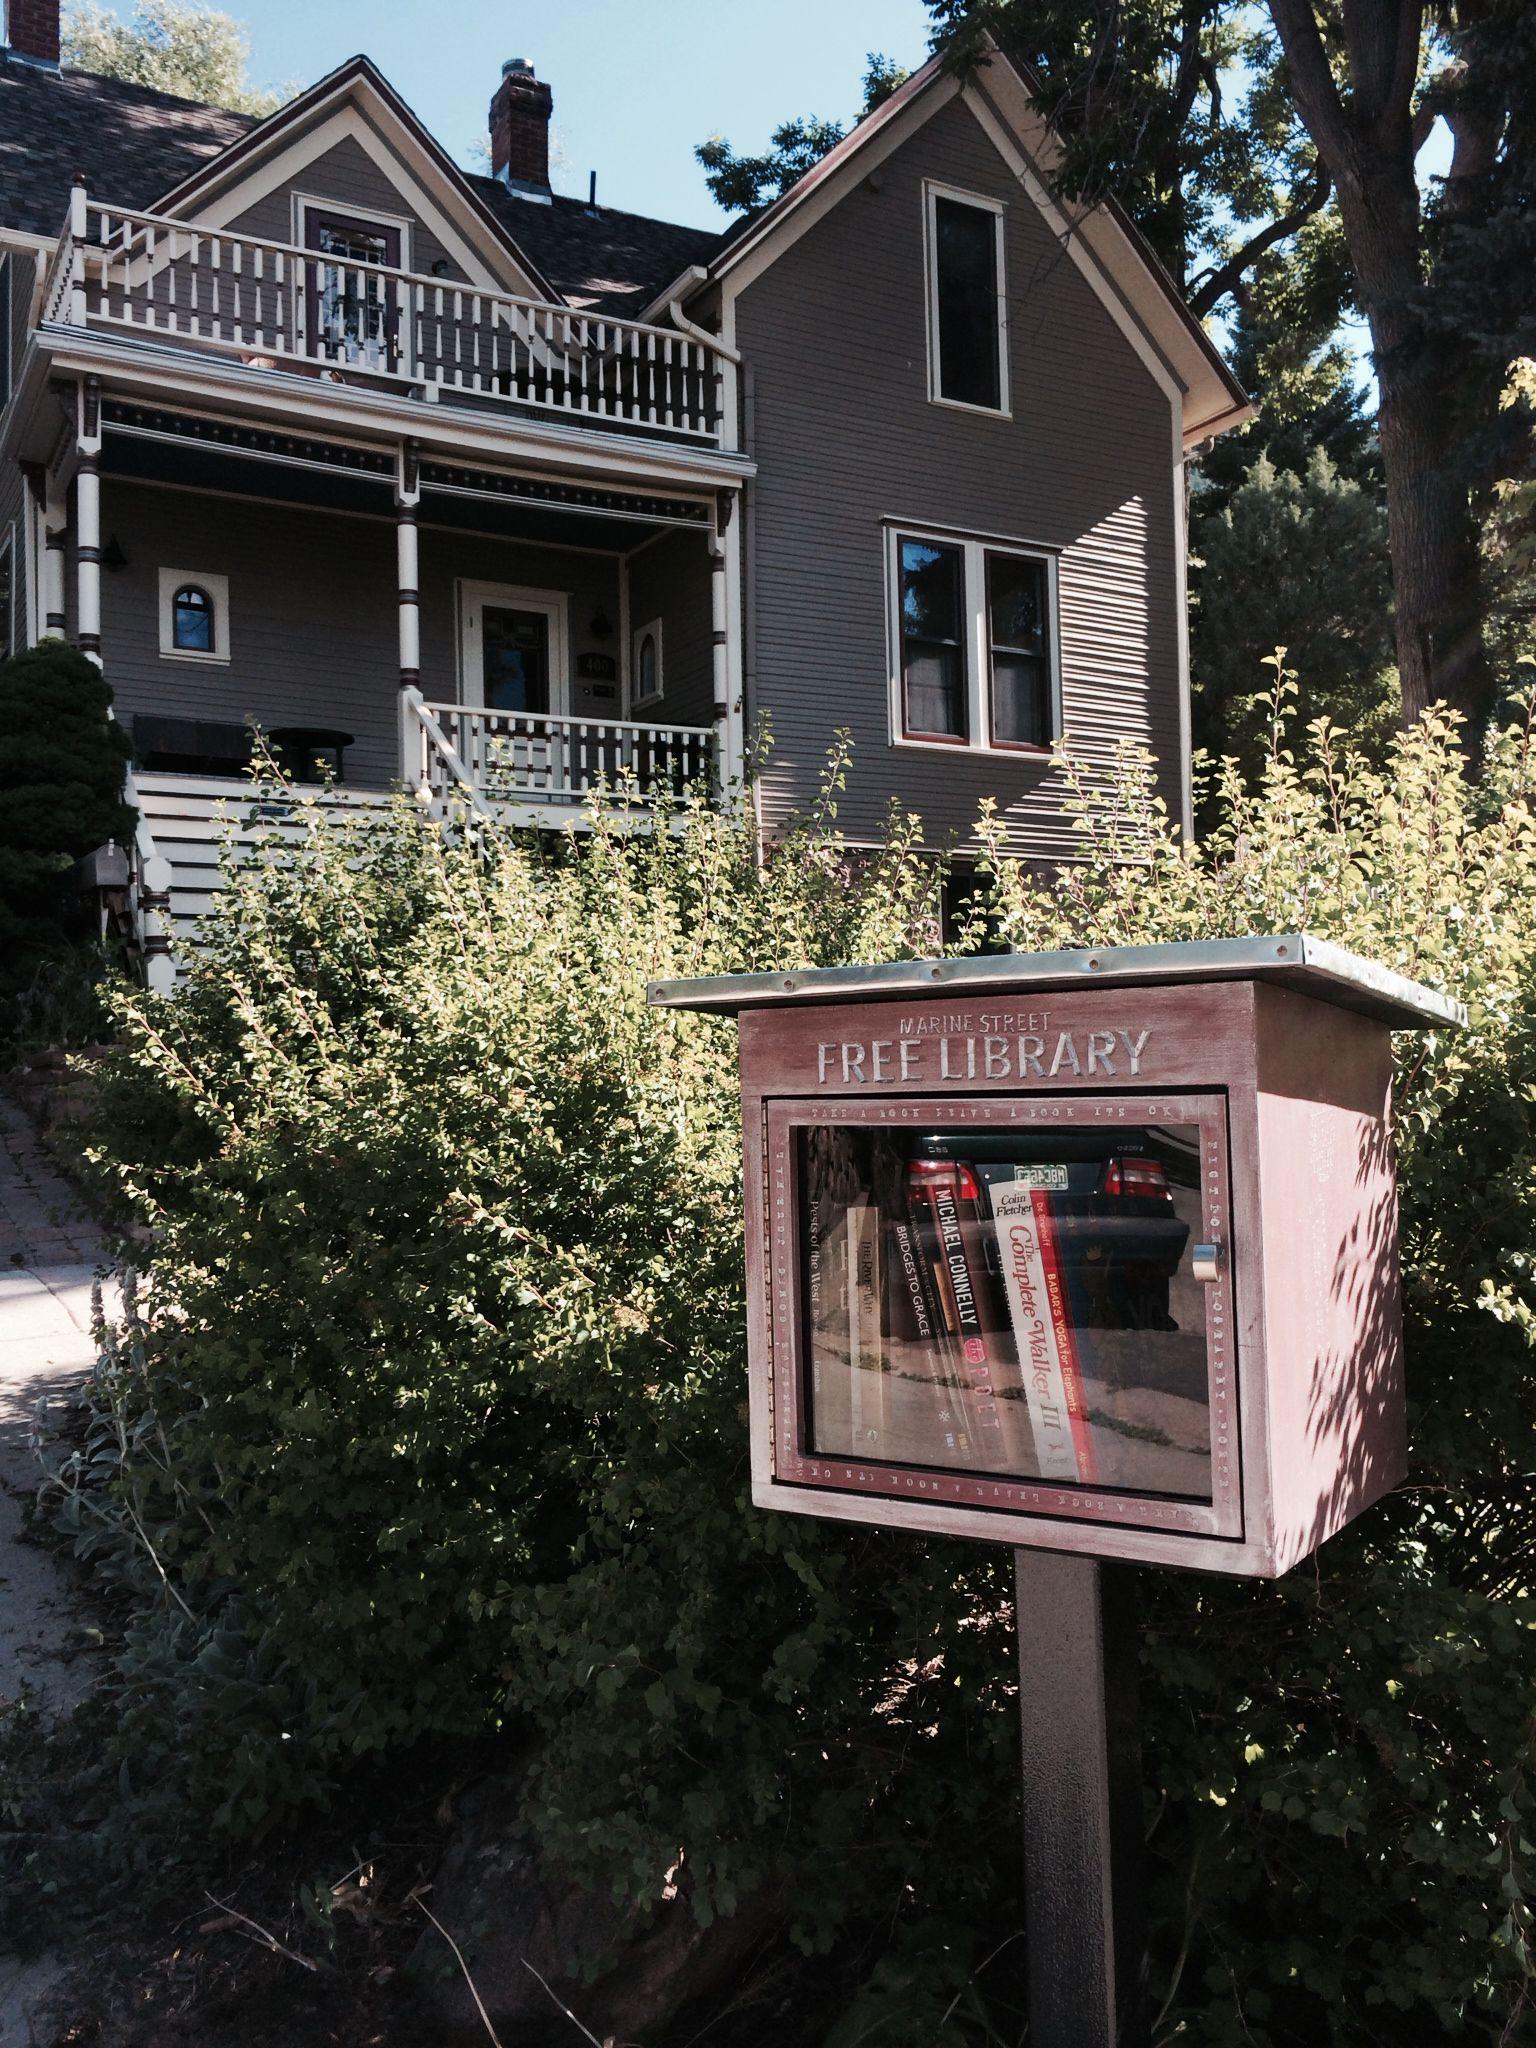 Seth Frankel. Boulder, CO. The Marine Street Free Library